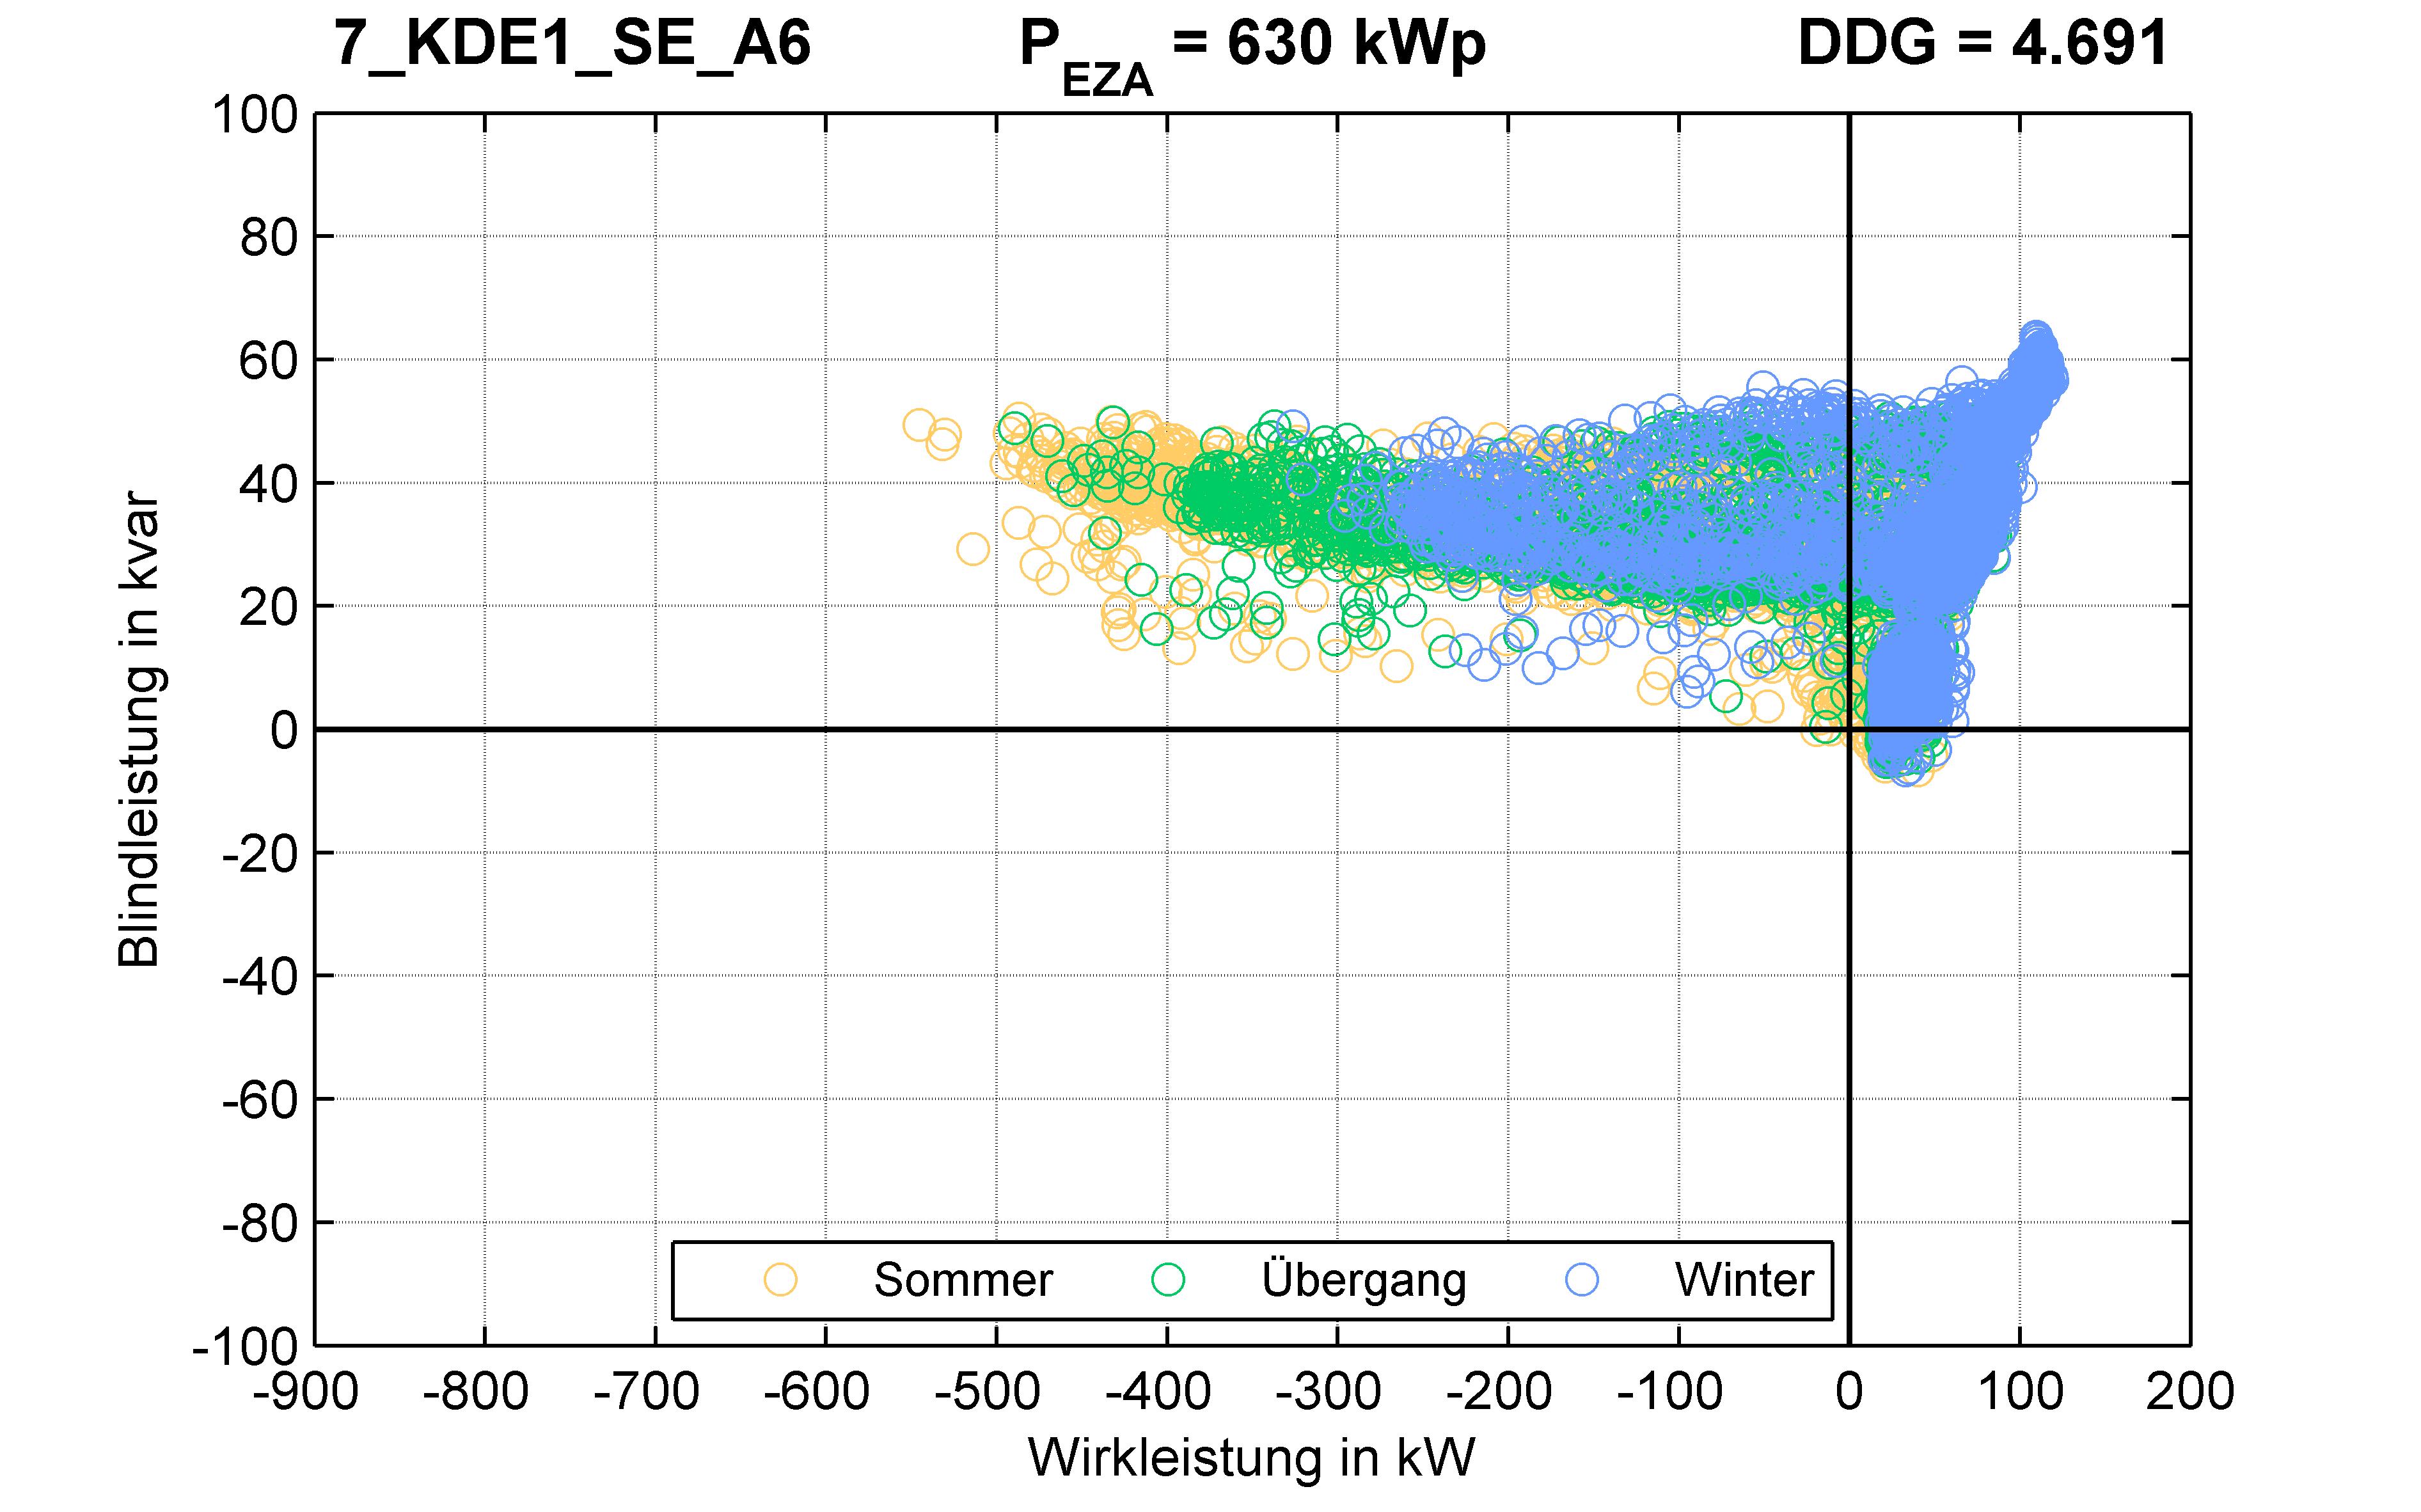 KDE1 | Längsregler (SE) A6 | PQ-Verhalten